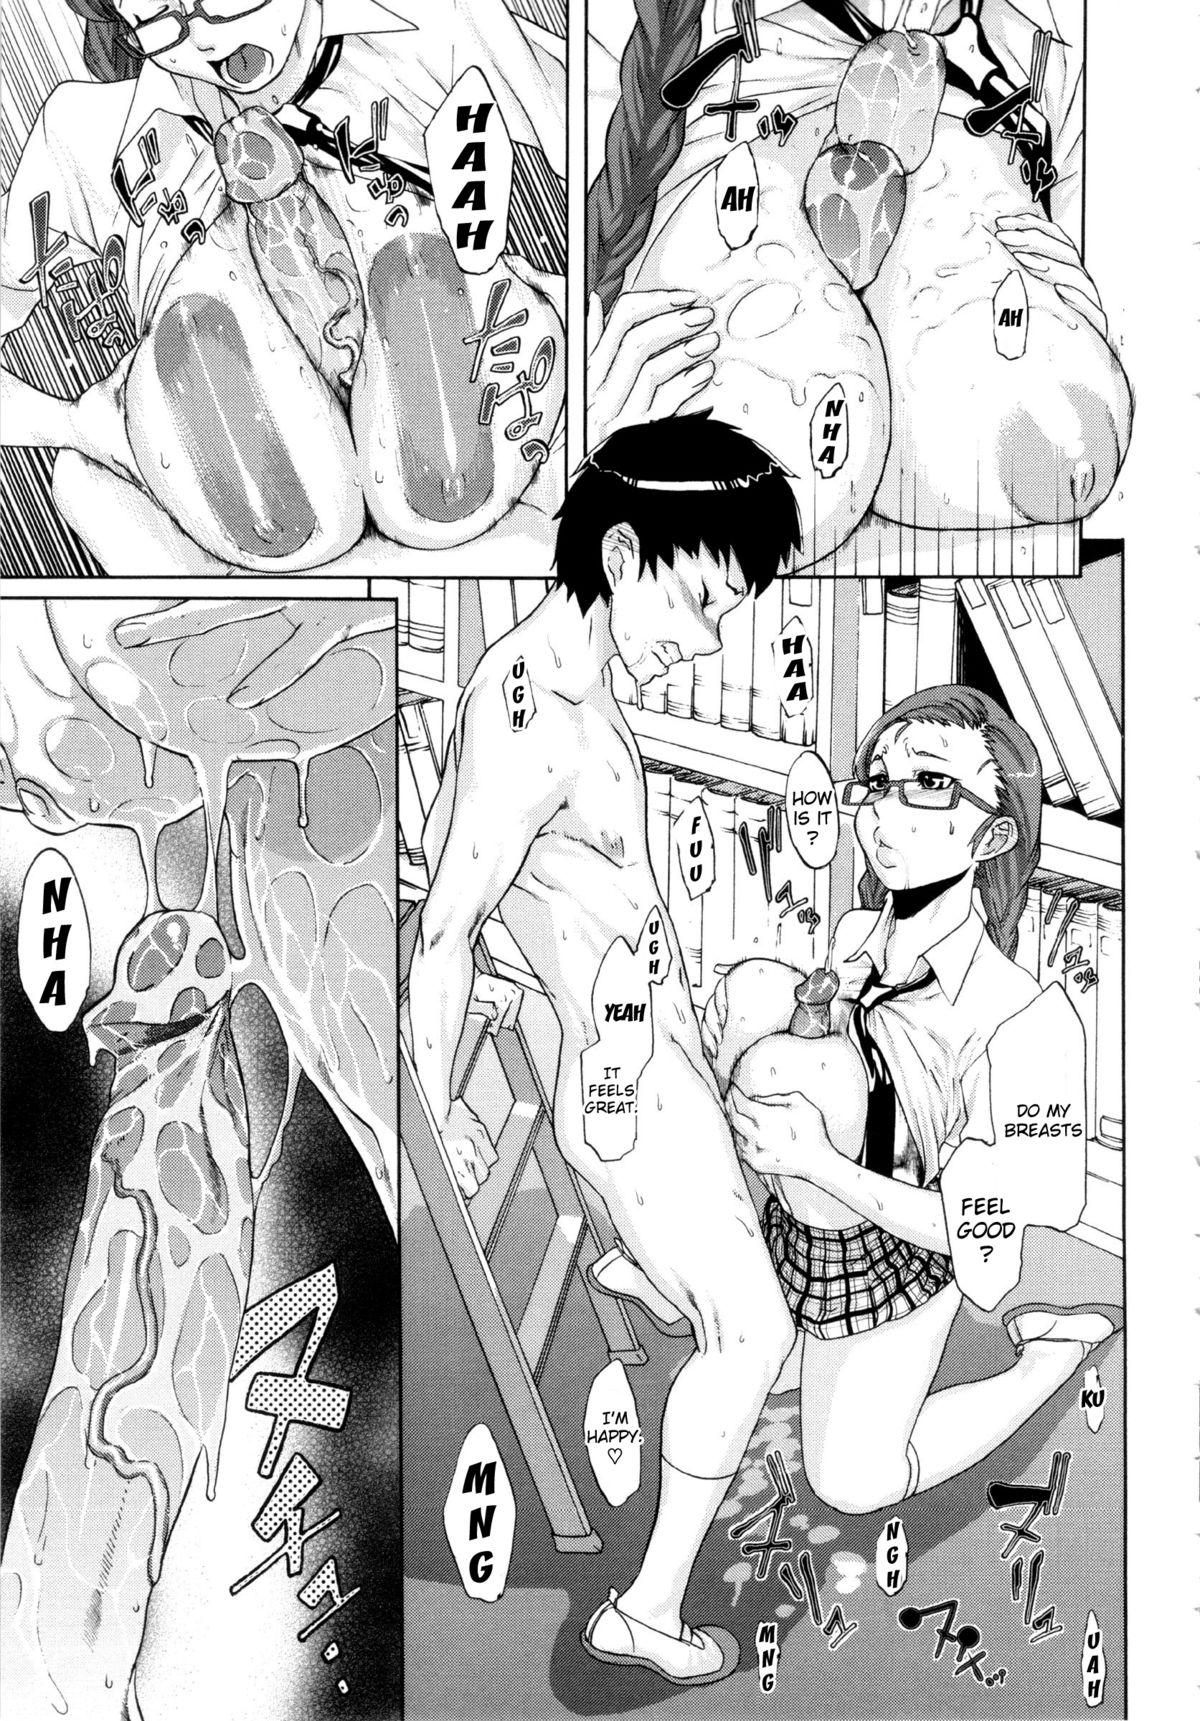 [Royal Koyanagi] Orgy Treasure Mansion GOLD Ch. 9 - 10  -  Nozomu Triangle & Orgy Showroom (Tank Version) [English] [Decensored] 12